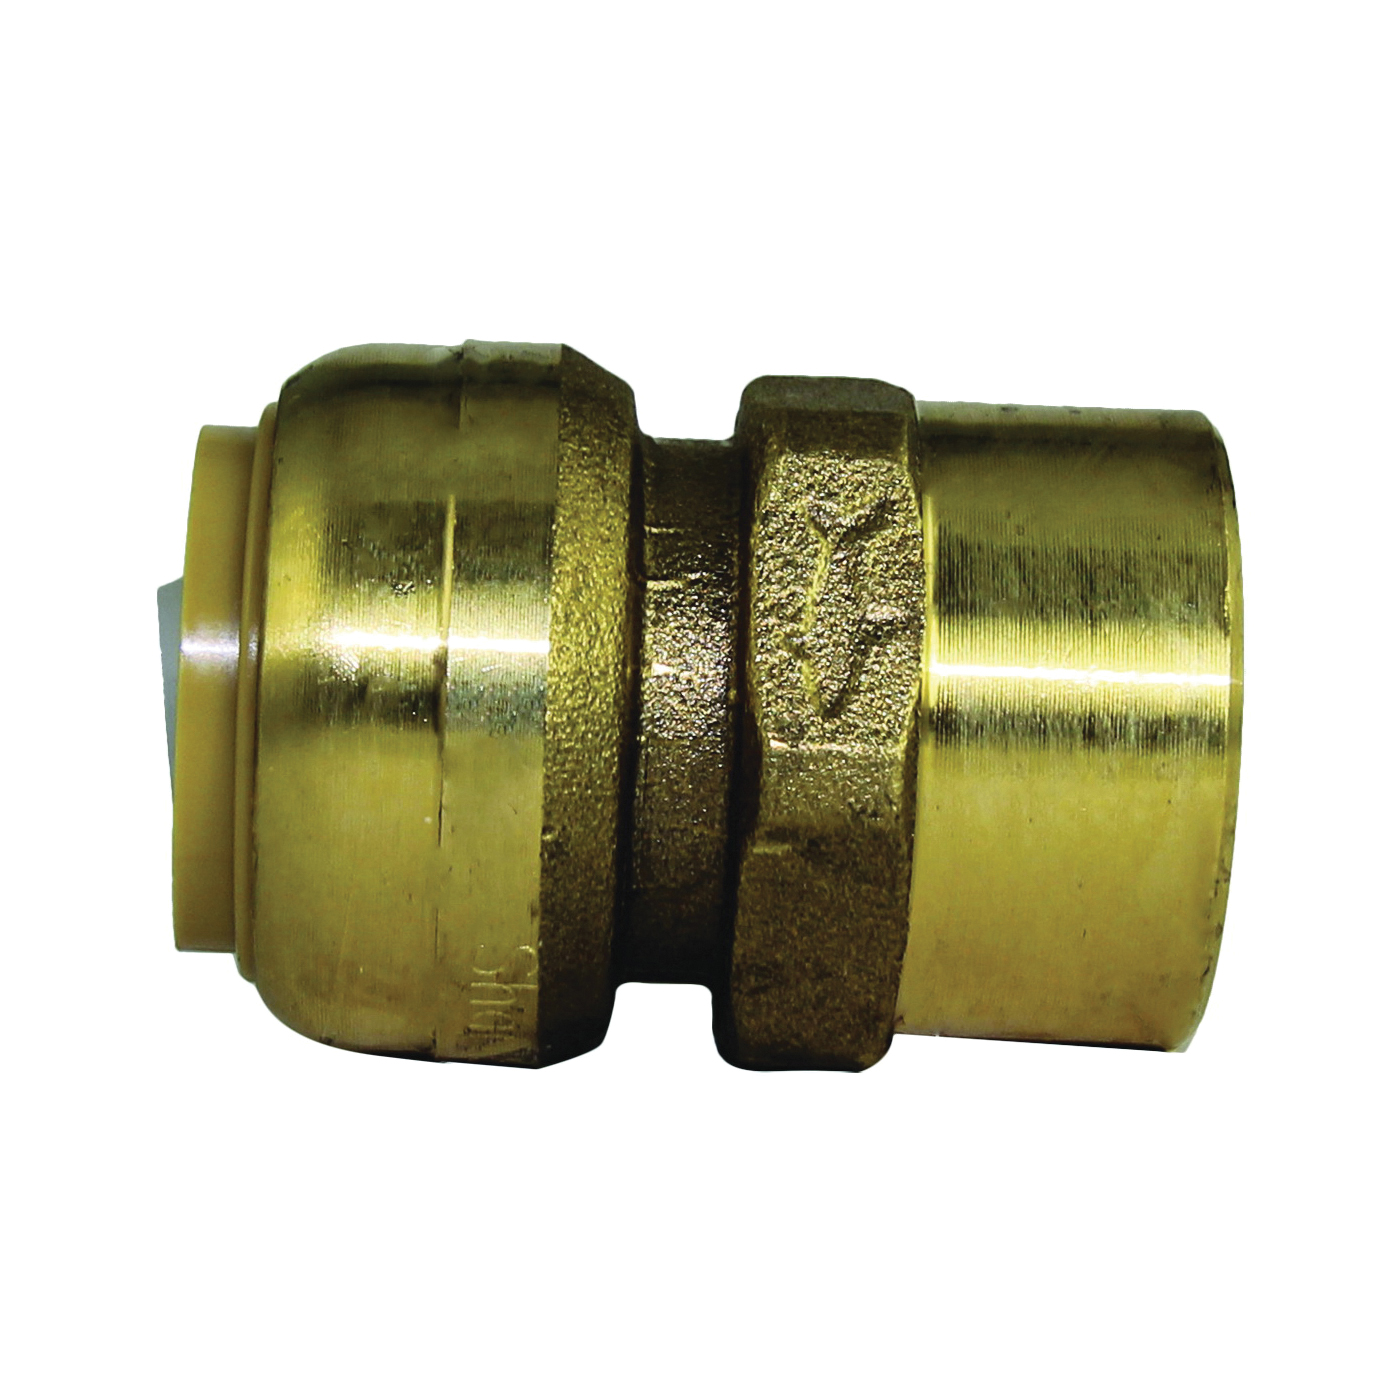 Picture of SharkBite U088LFA Pipe Connector, 3/4 in, FNPT x FNPT, Brass, 200 psi Pressure